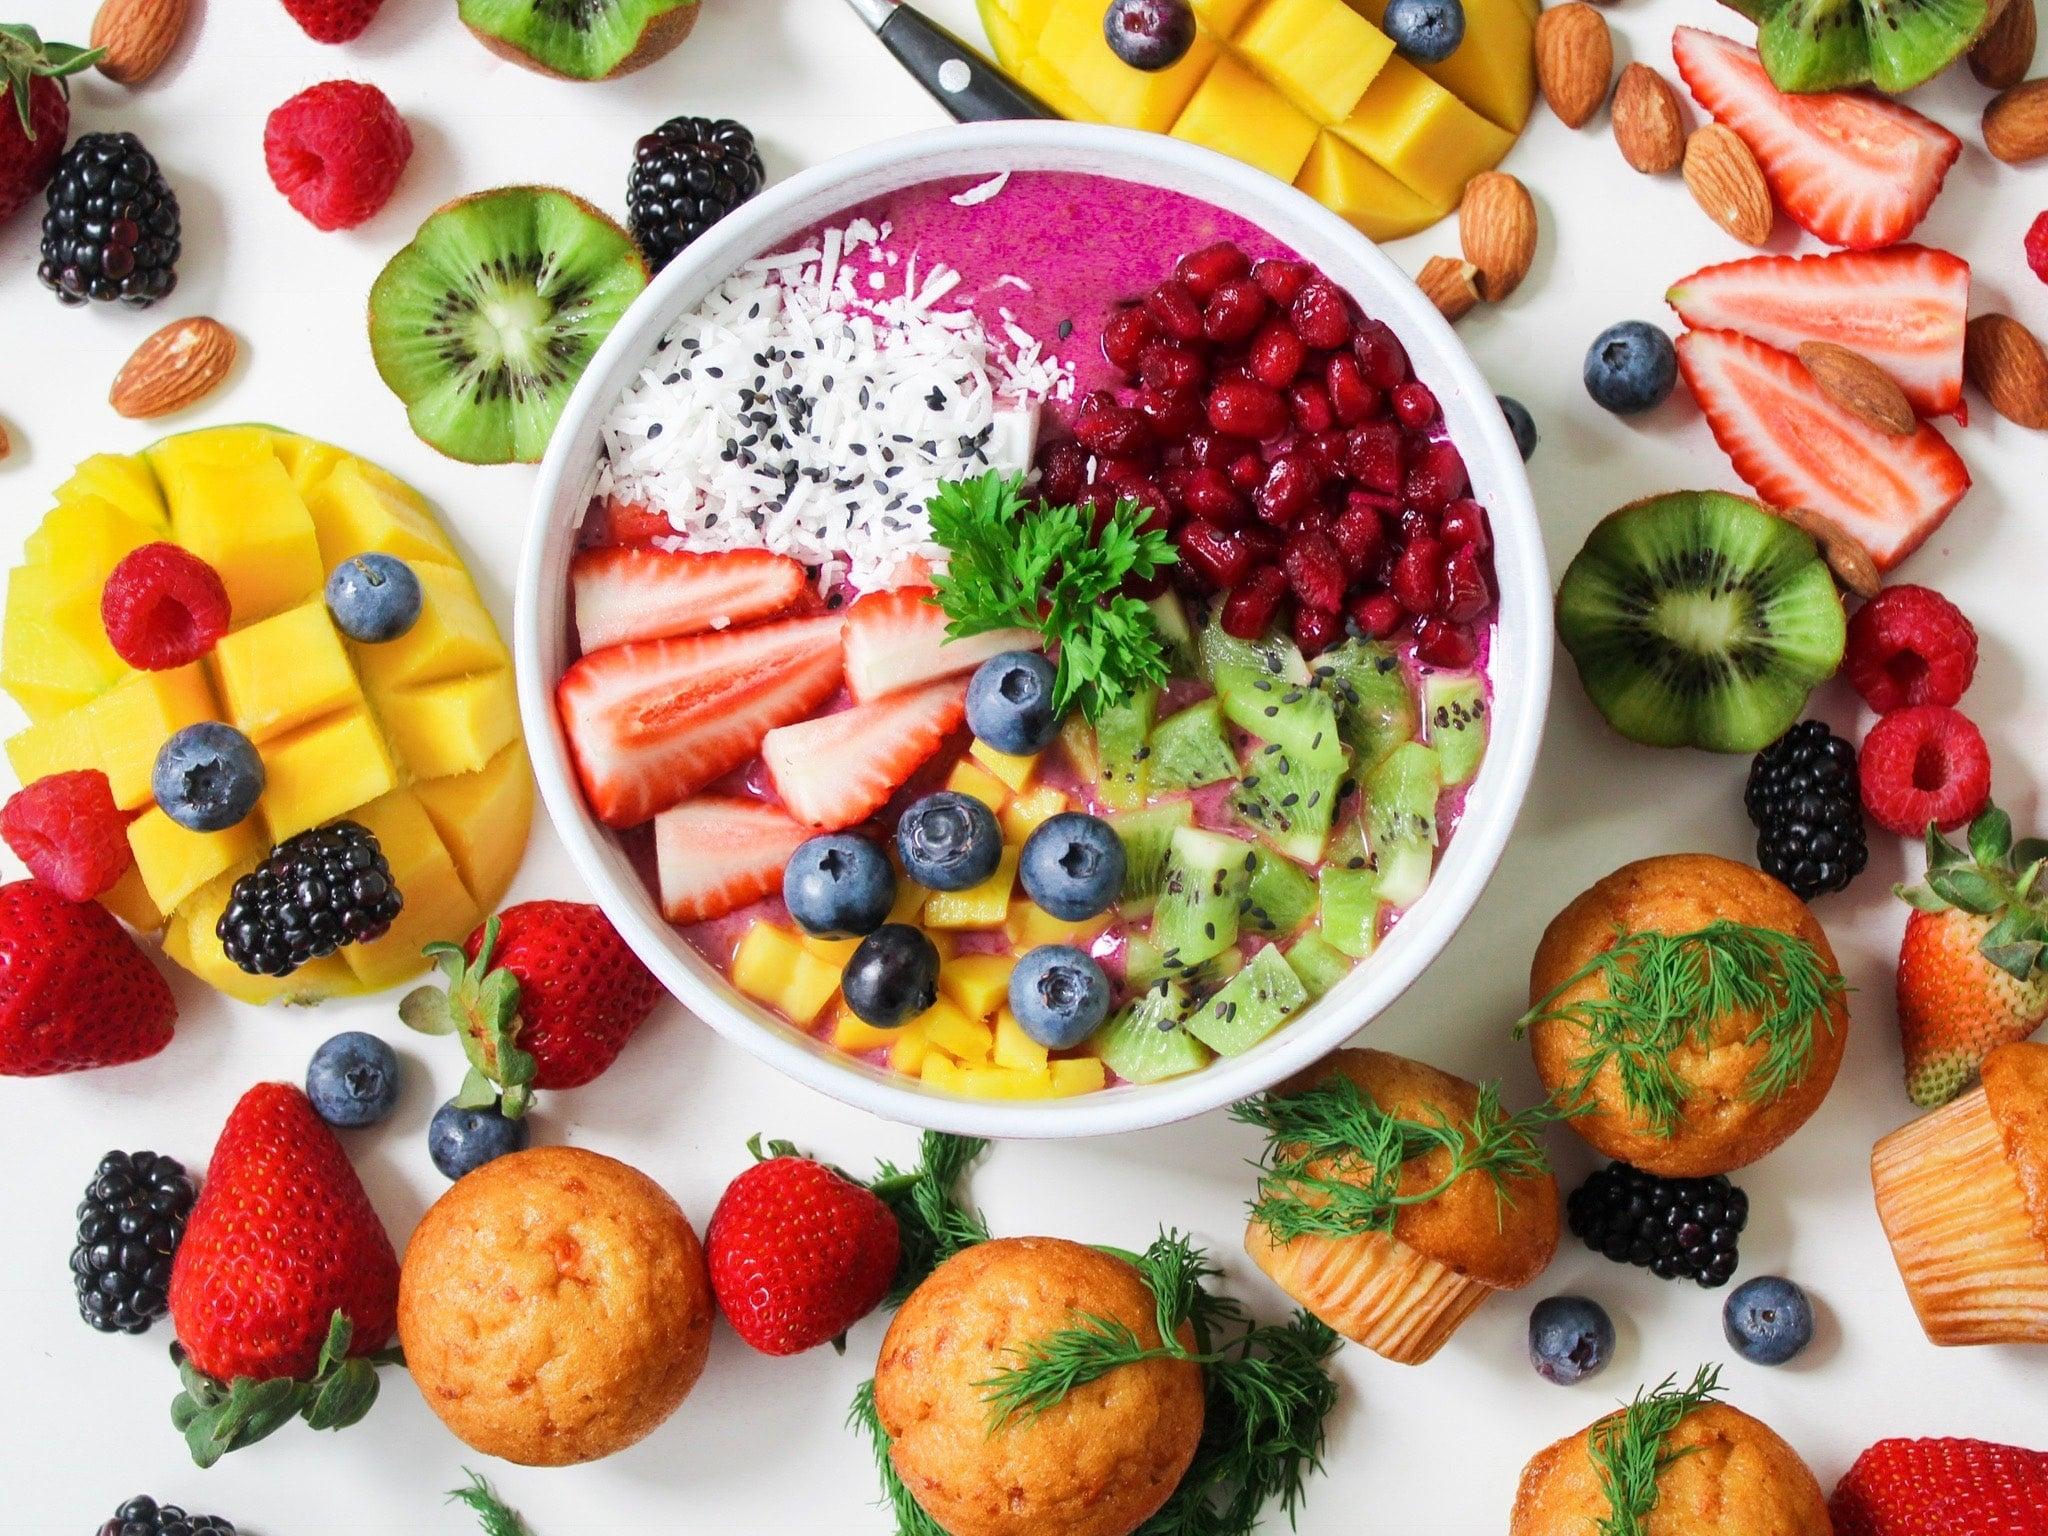 Frutas diversas em uma tigela. Manga, morangos, kiwis, blueberrys, laranja.